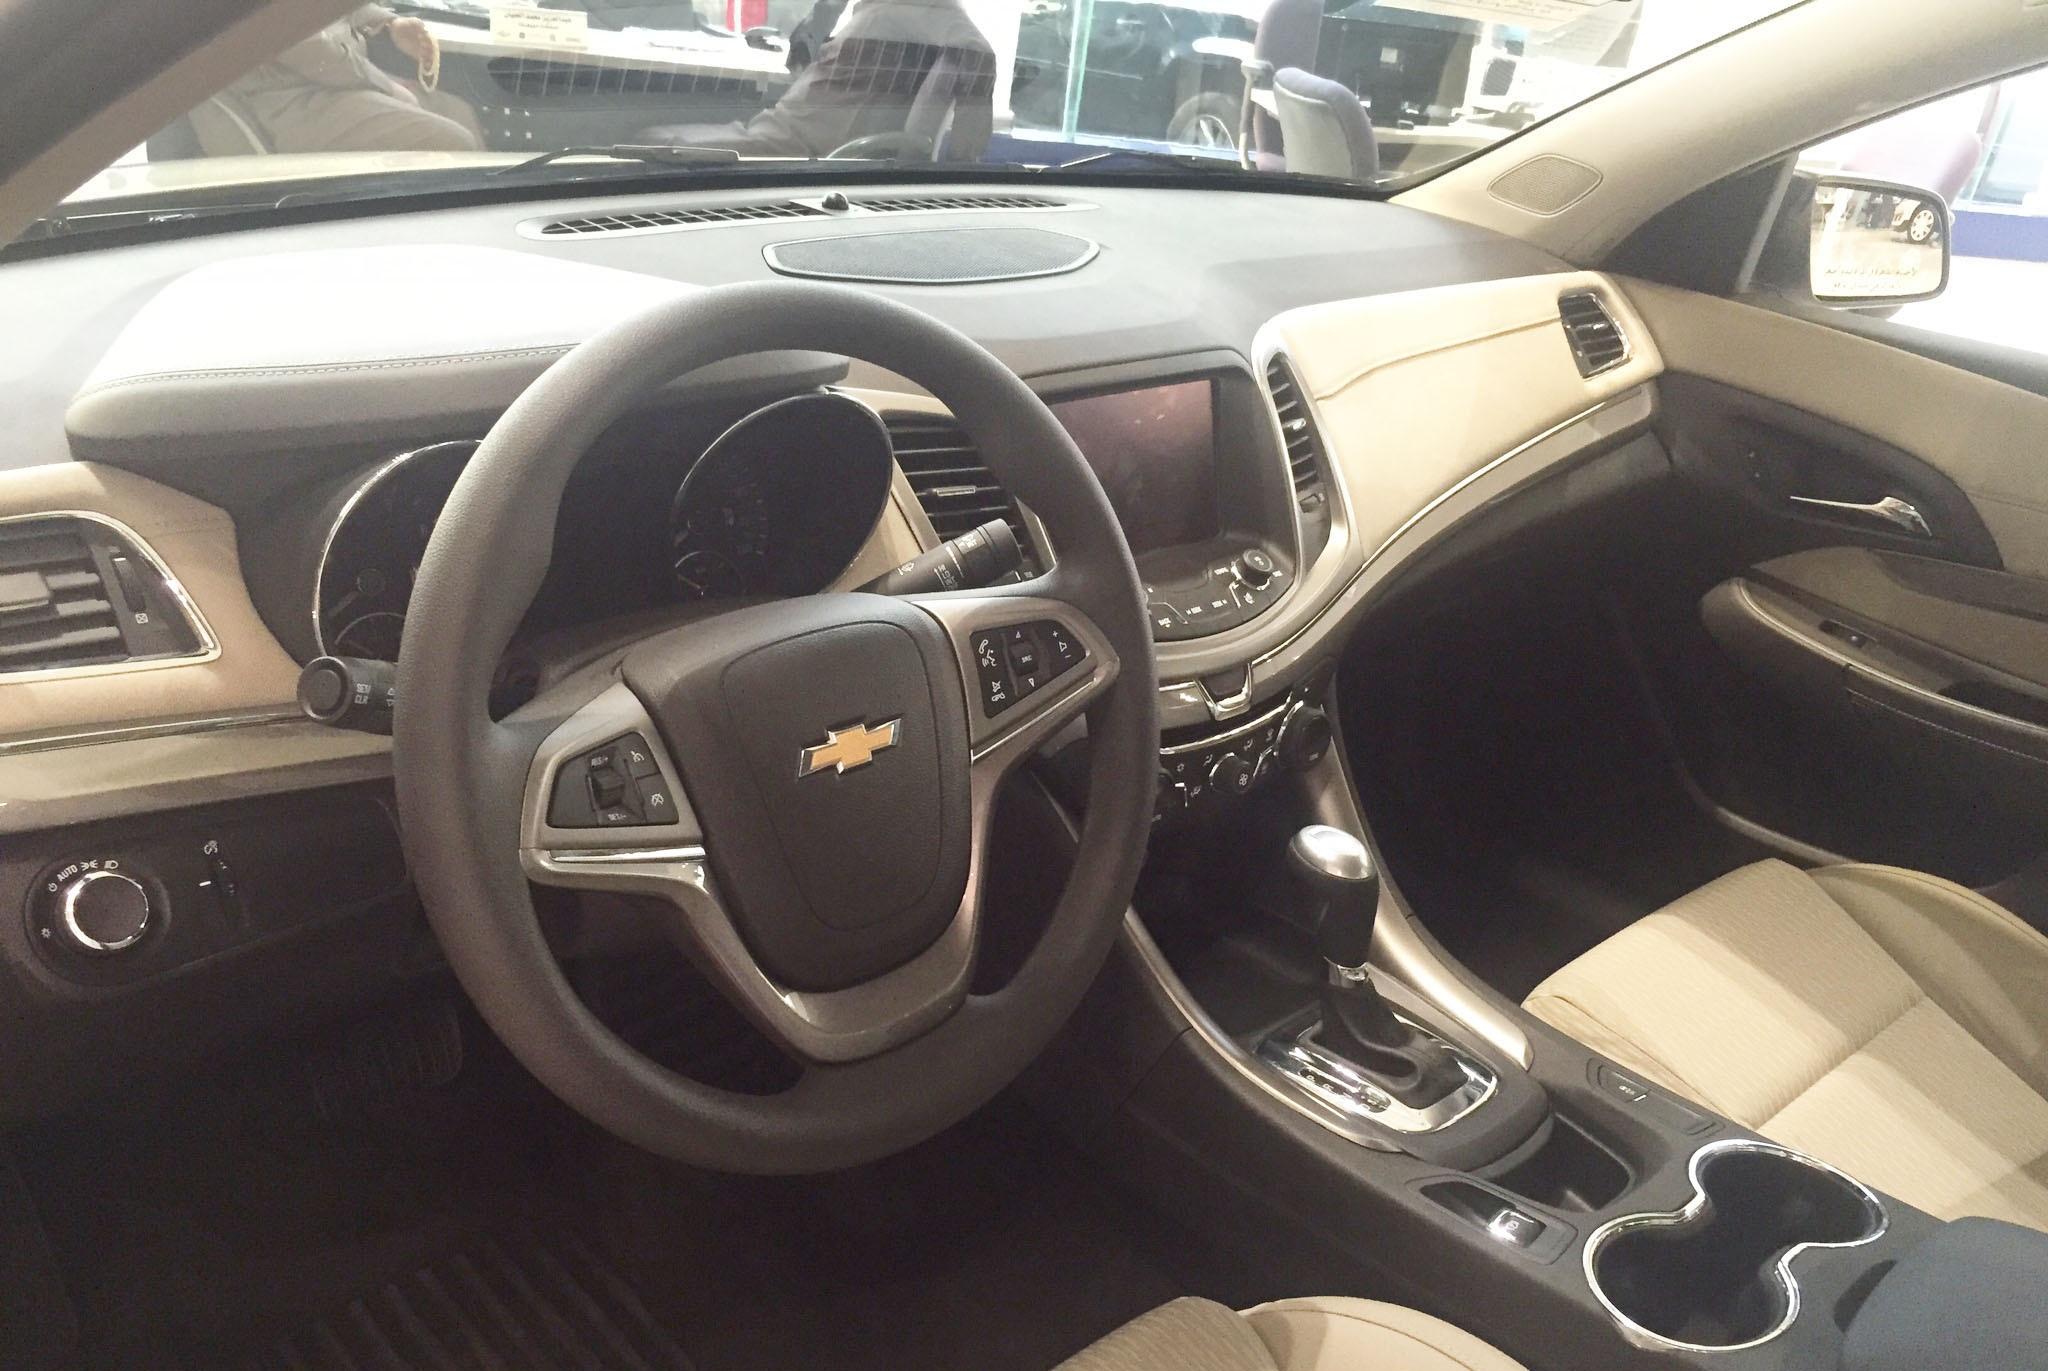 Used 2015 Chevrolet Tahoe For Sale  CarGurus